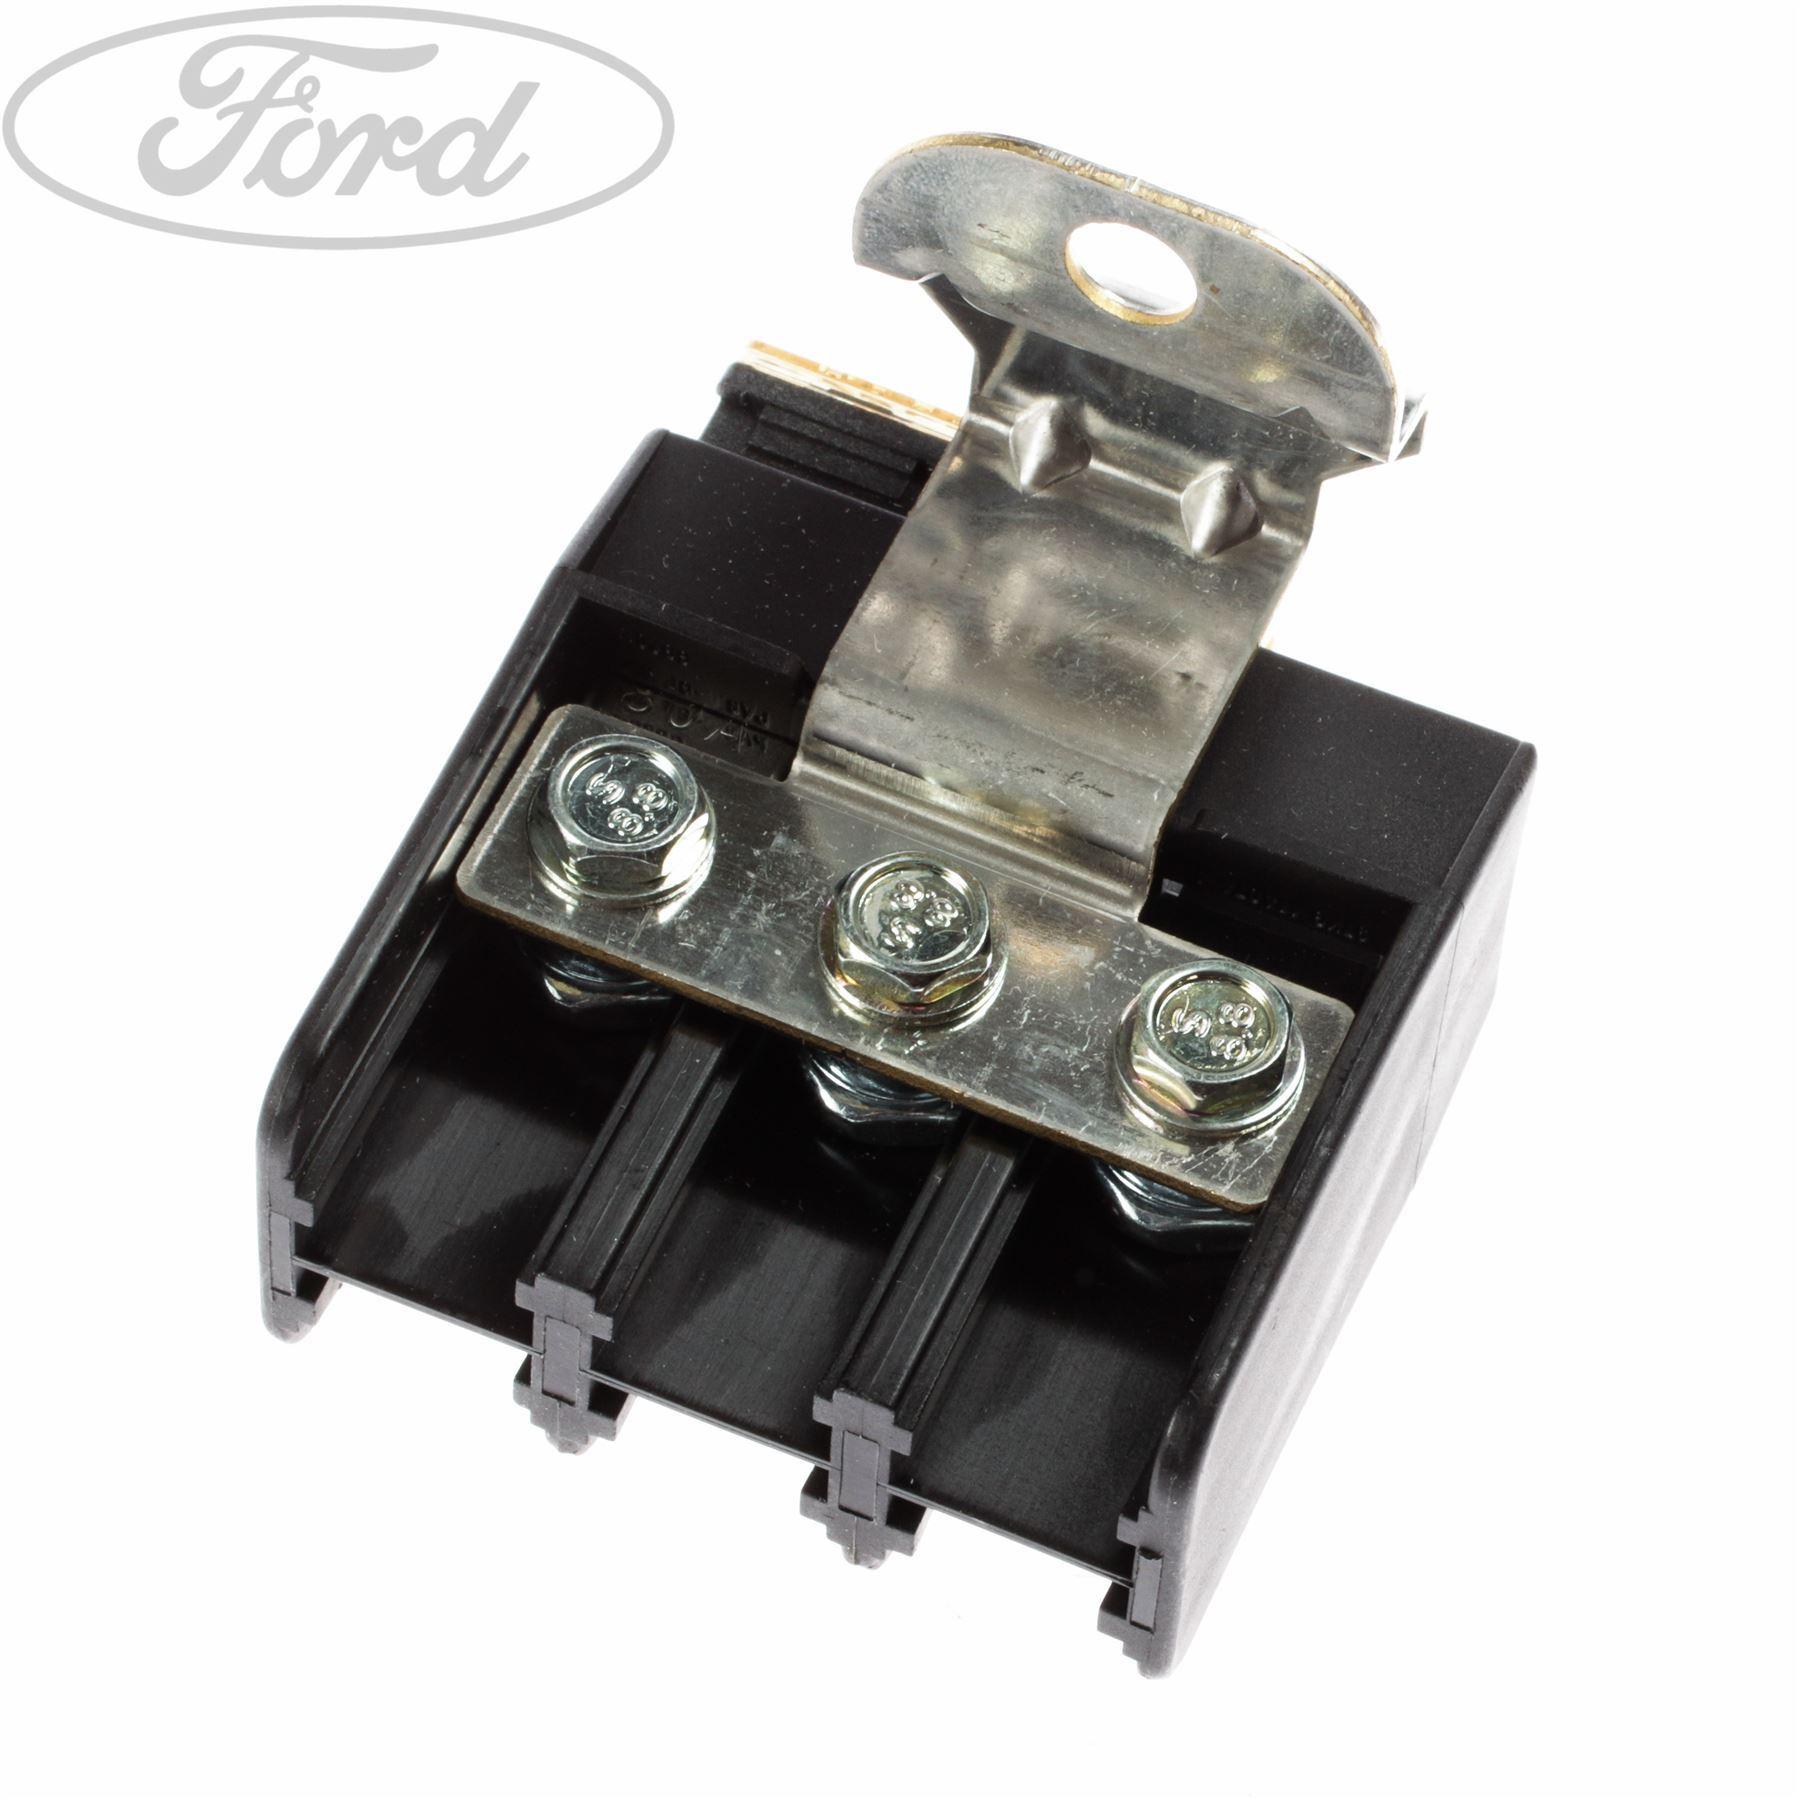 hight resolution of details about genuine ford ka mk1 fuse junction panel 1039794